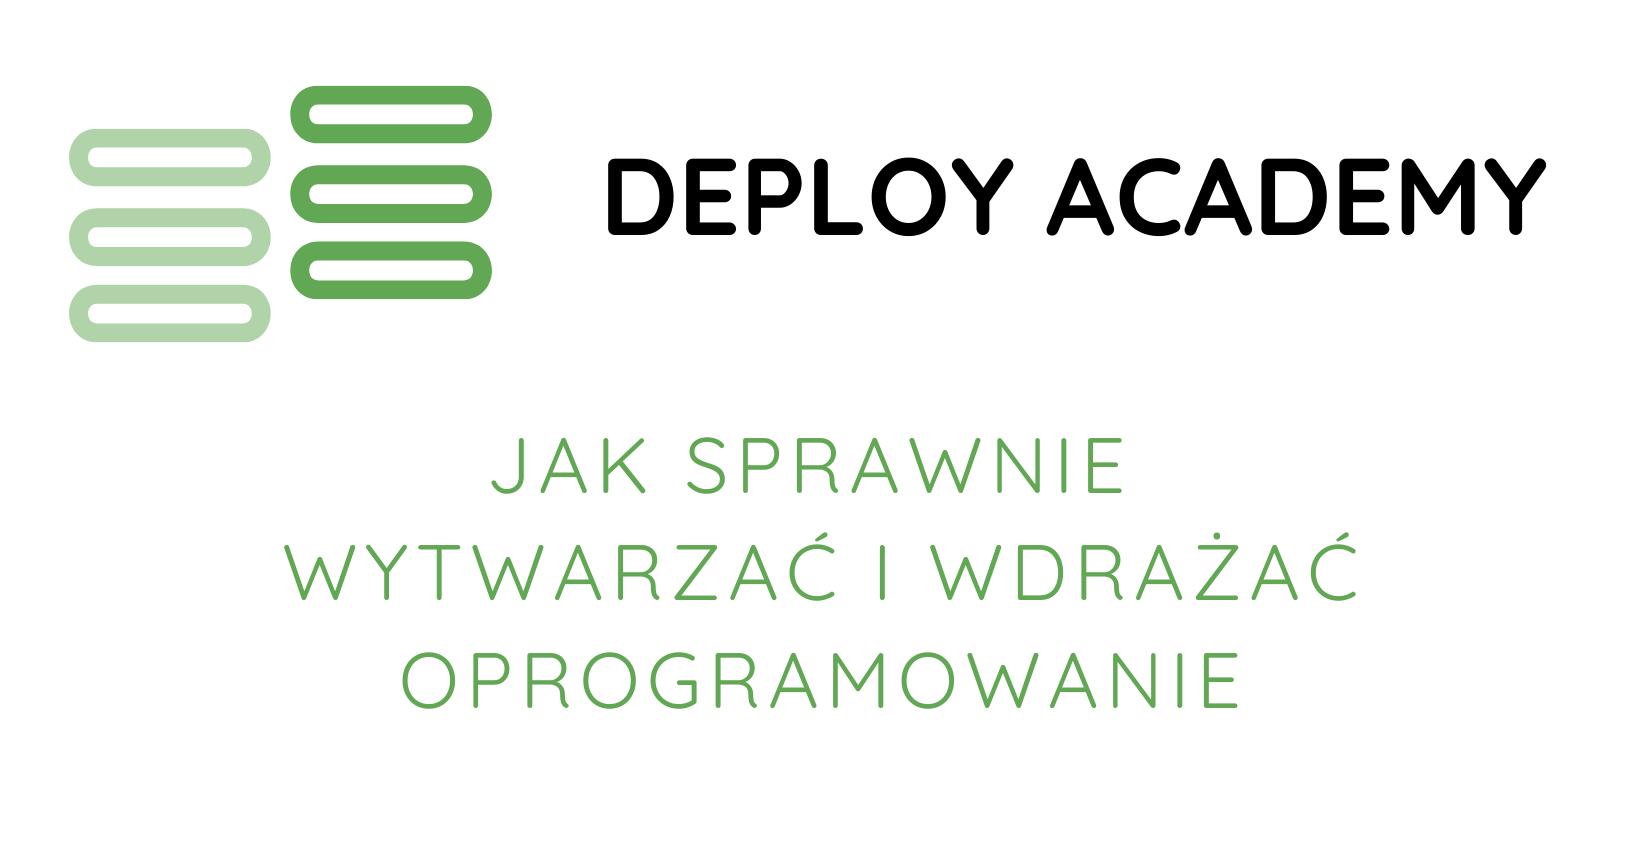 Copy of Deploy Academy Logo (1)